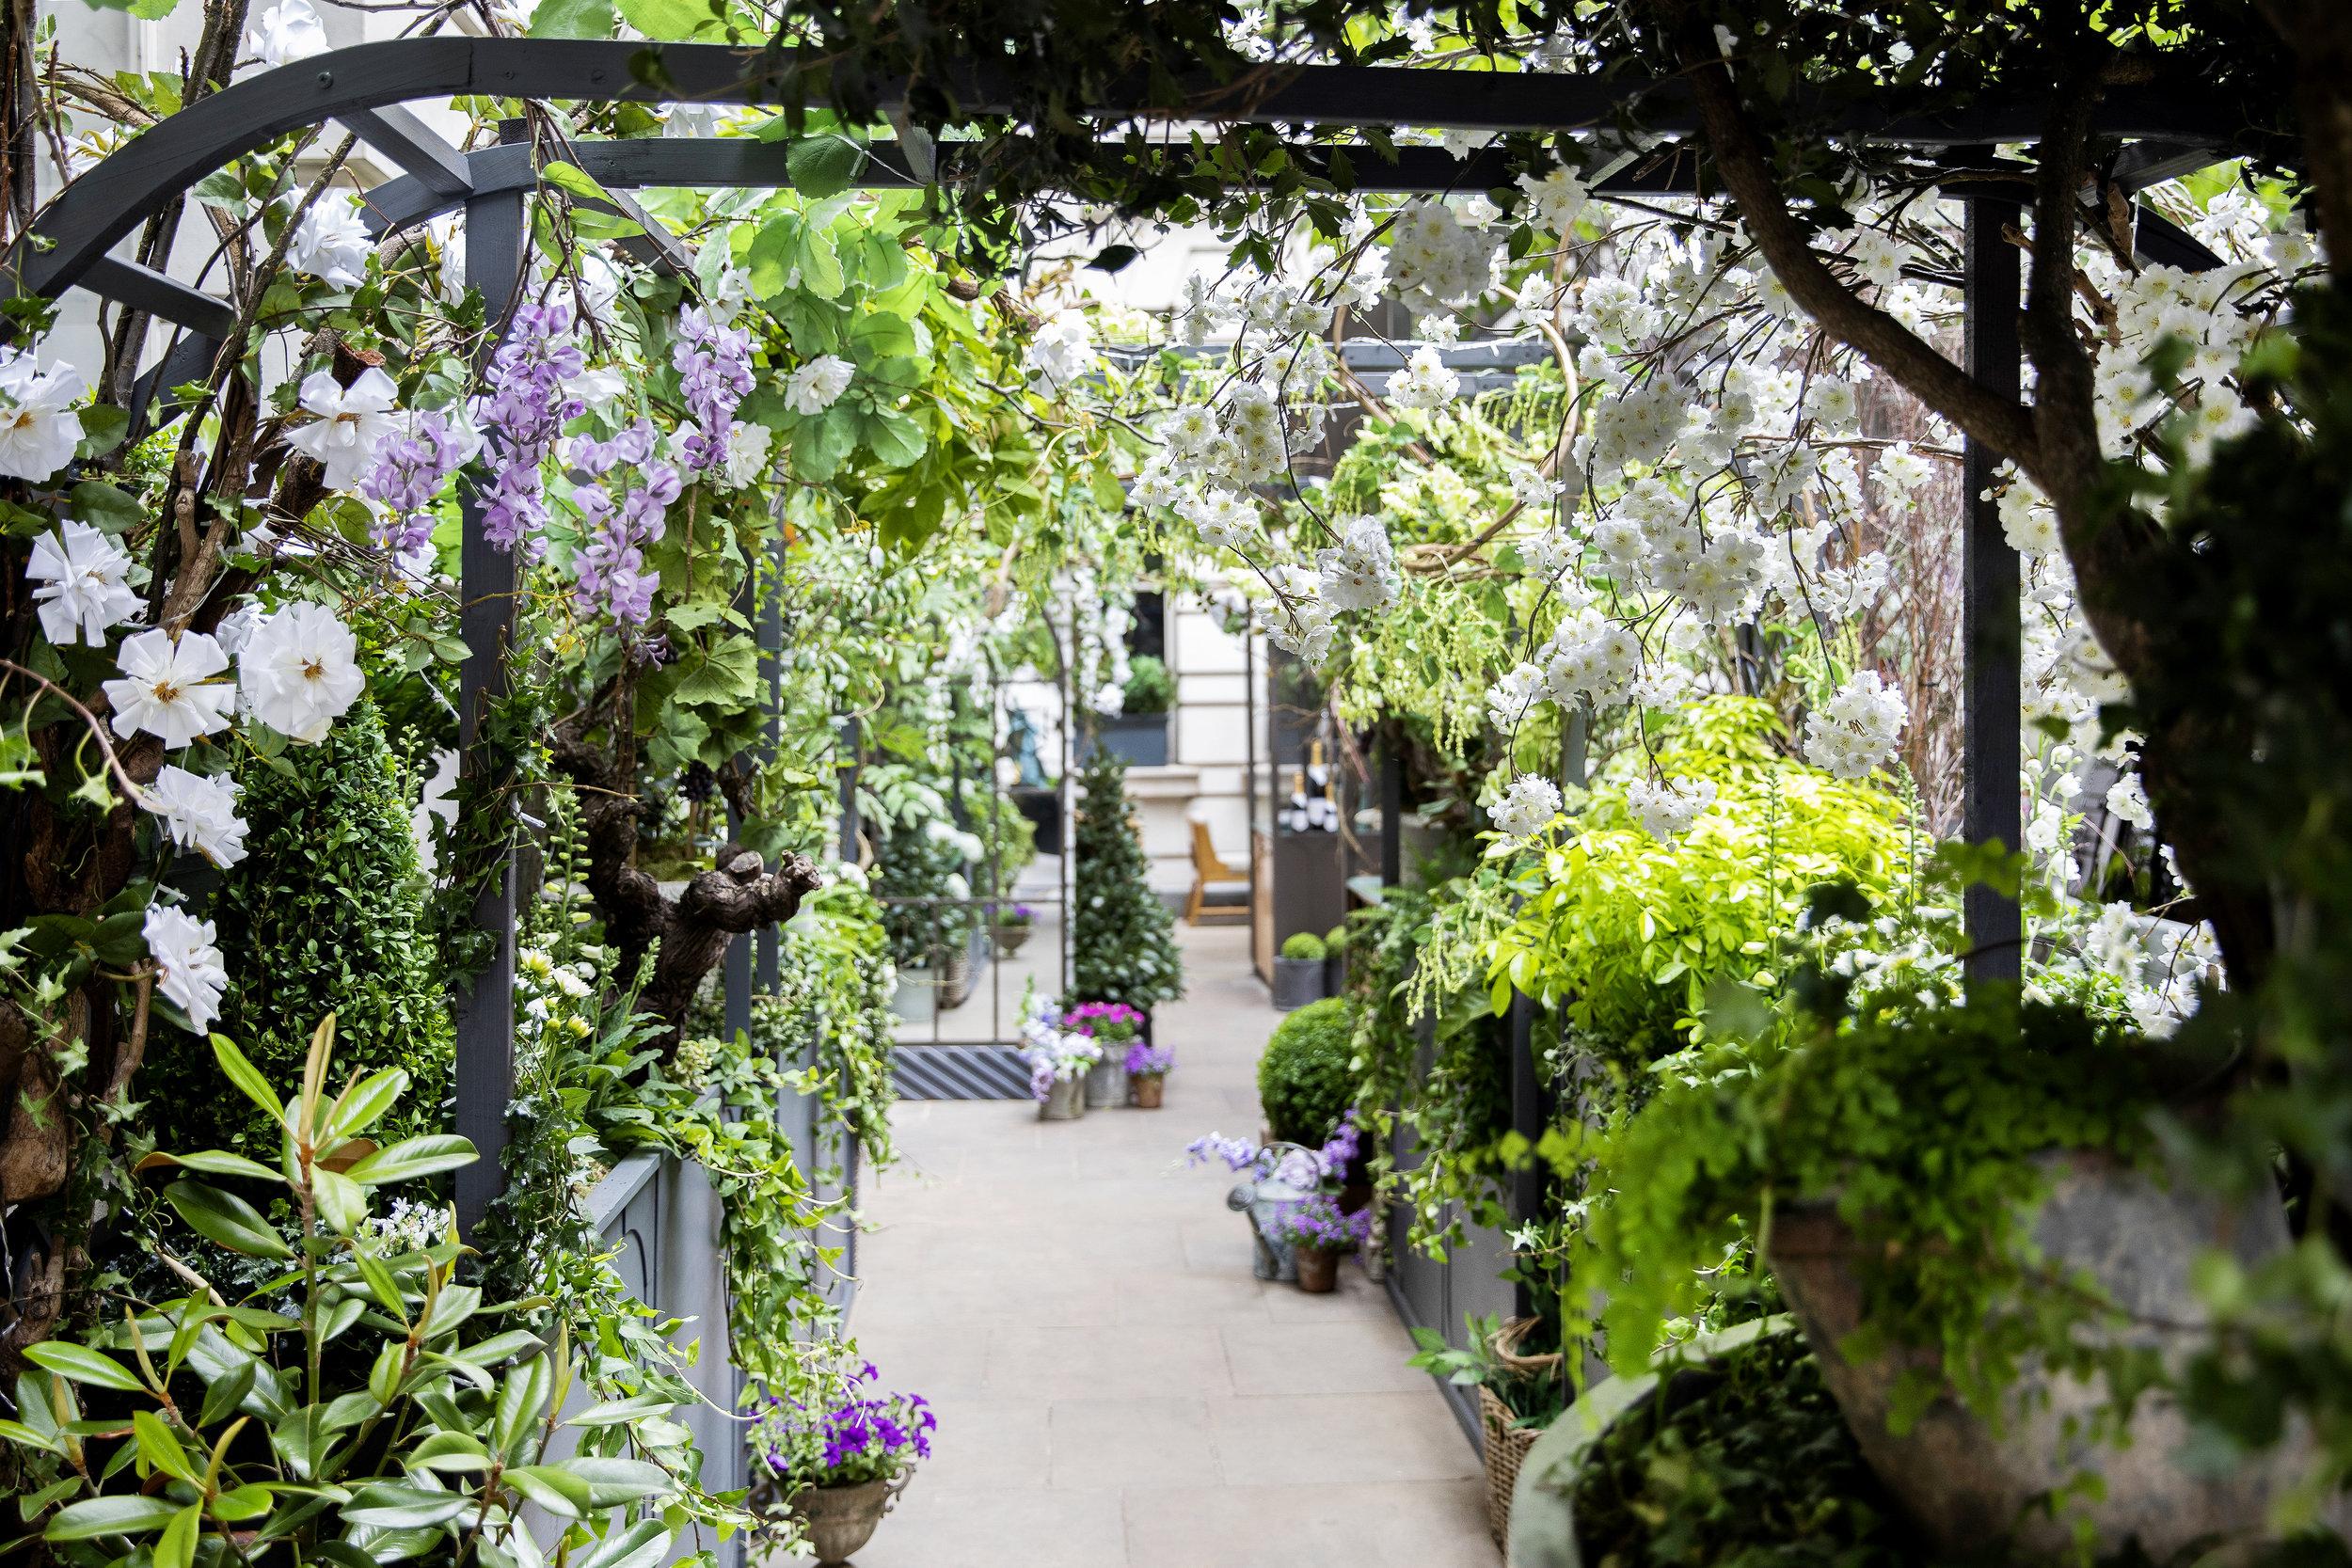 Holborn Dining Room_The Nyetimber Secret Garden_Entrance_©John Carey (4).jpg